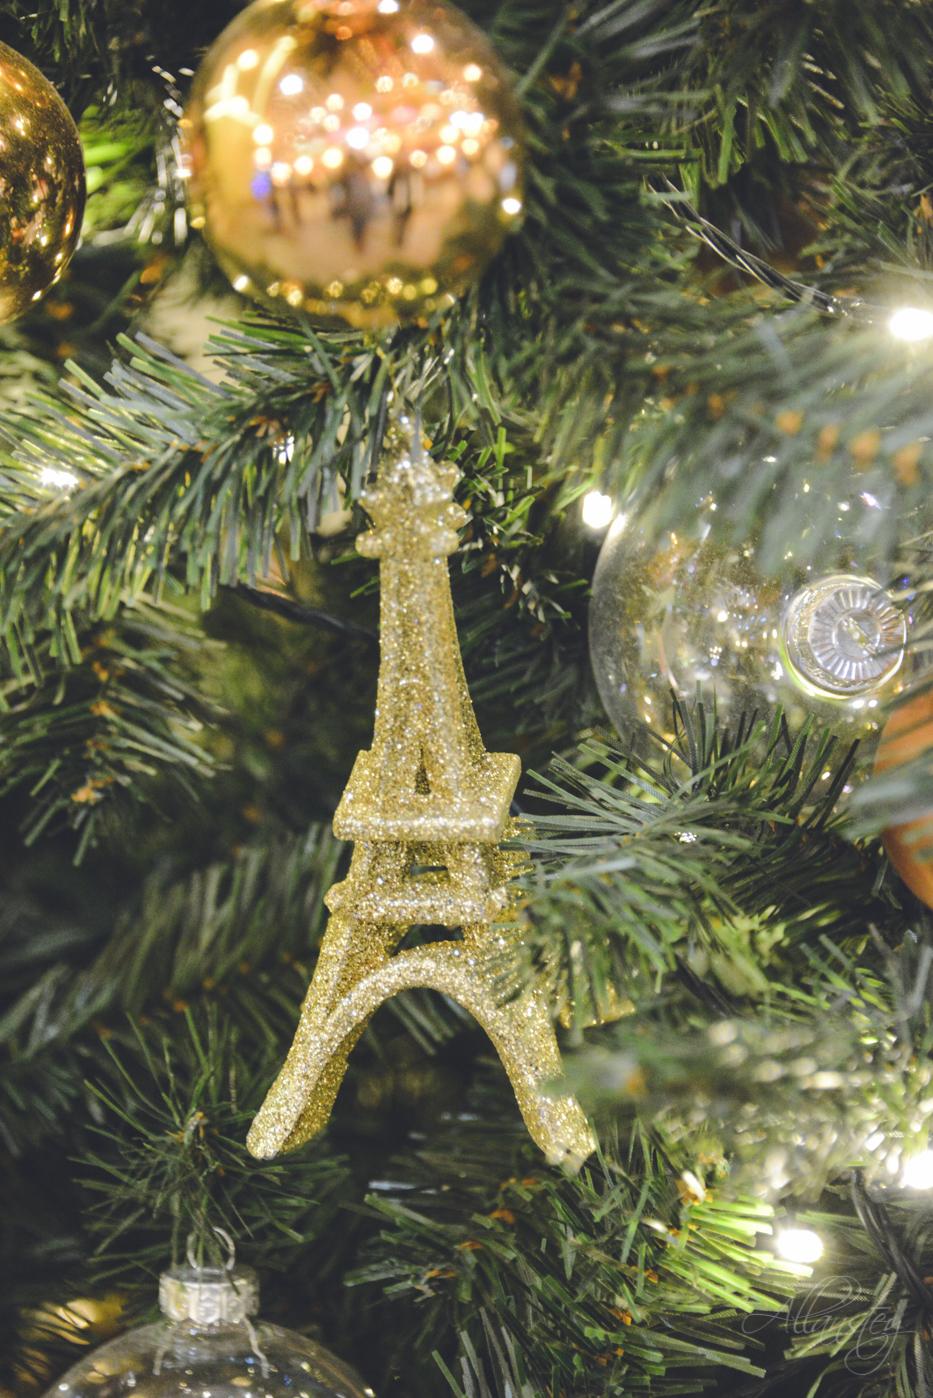 Eiffel Tower Christmas decoration